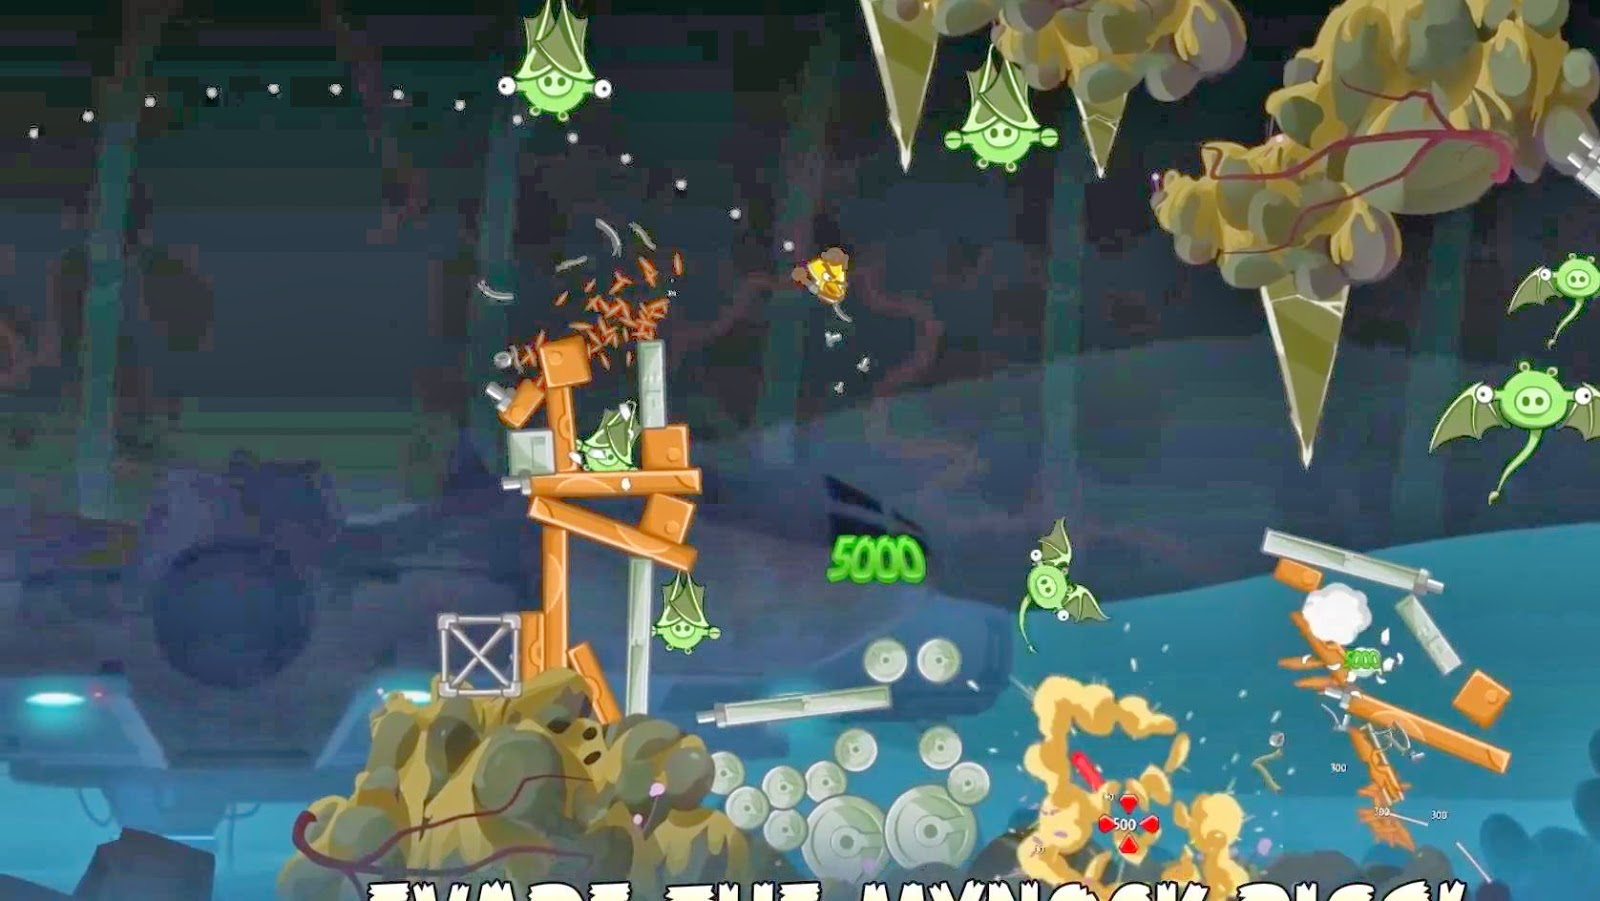 Angry Birds star wars مظغوطة,بوابة 2013 angry-birds-star-war